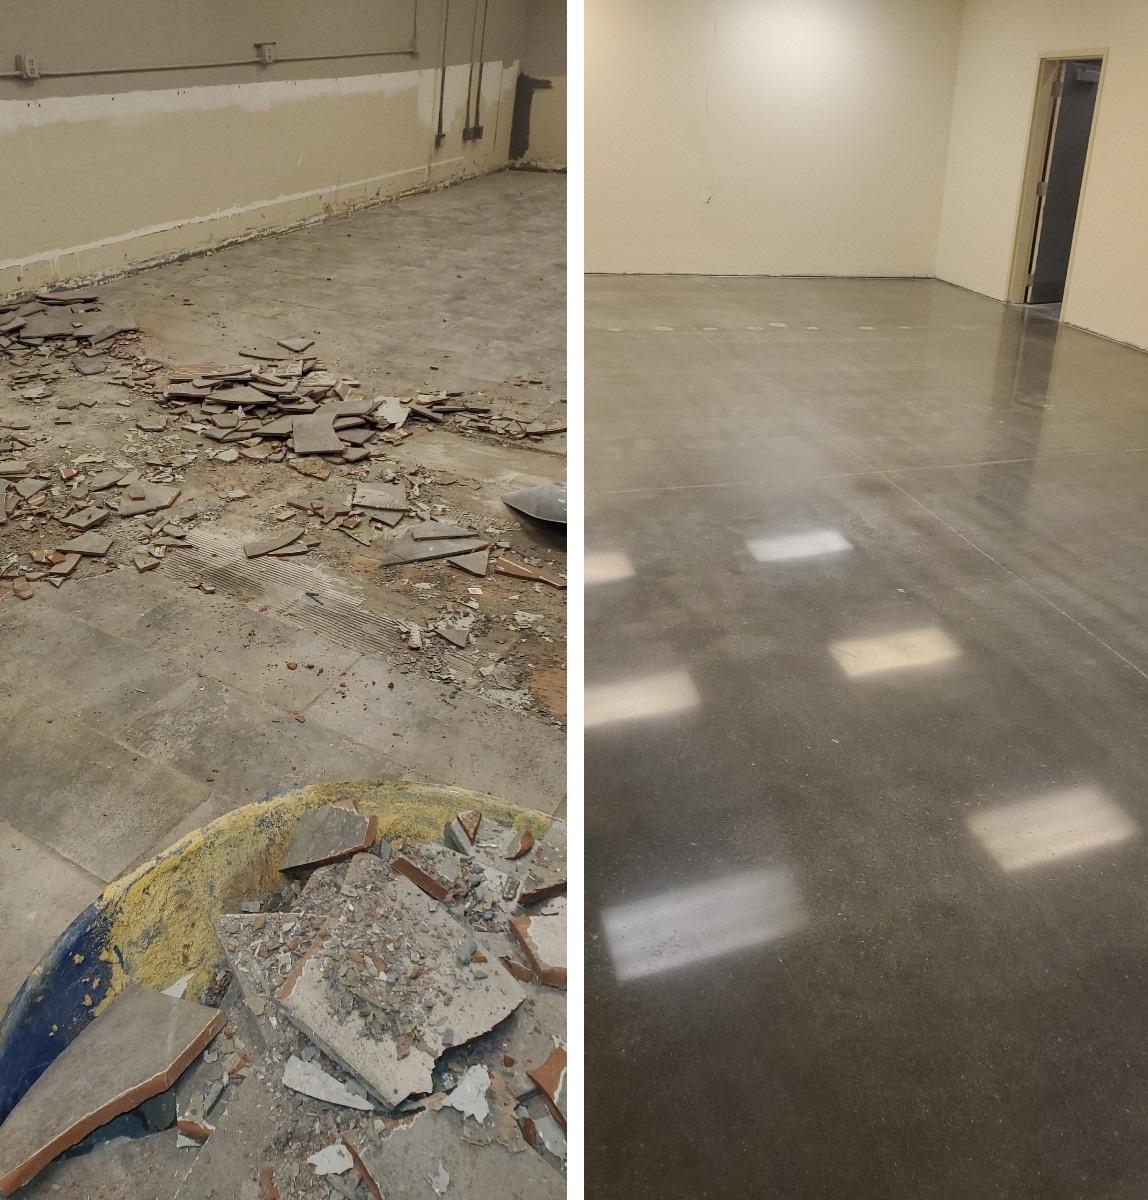 Demo work, breakroom polish, surface preparation, polished concrete, polish concrete, Industrial Applications, Inc. IA30yrs, TeamIA